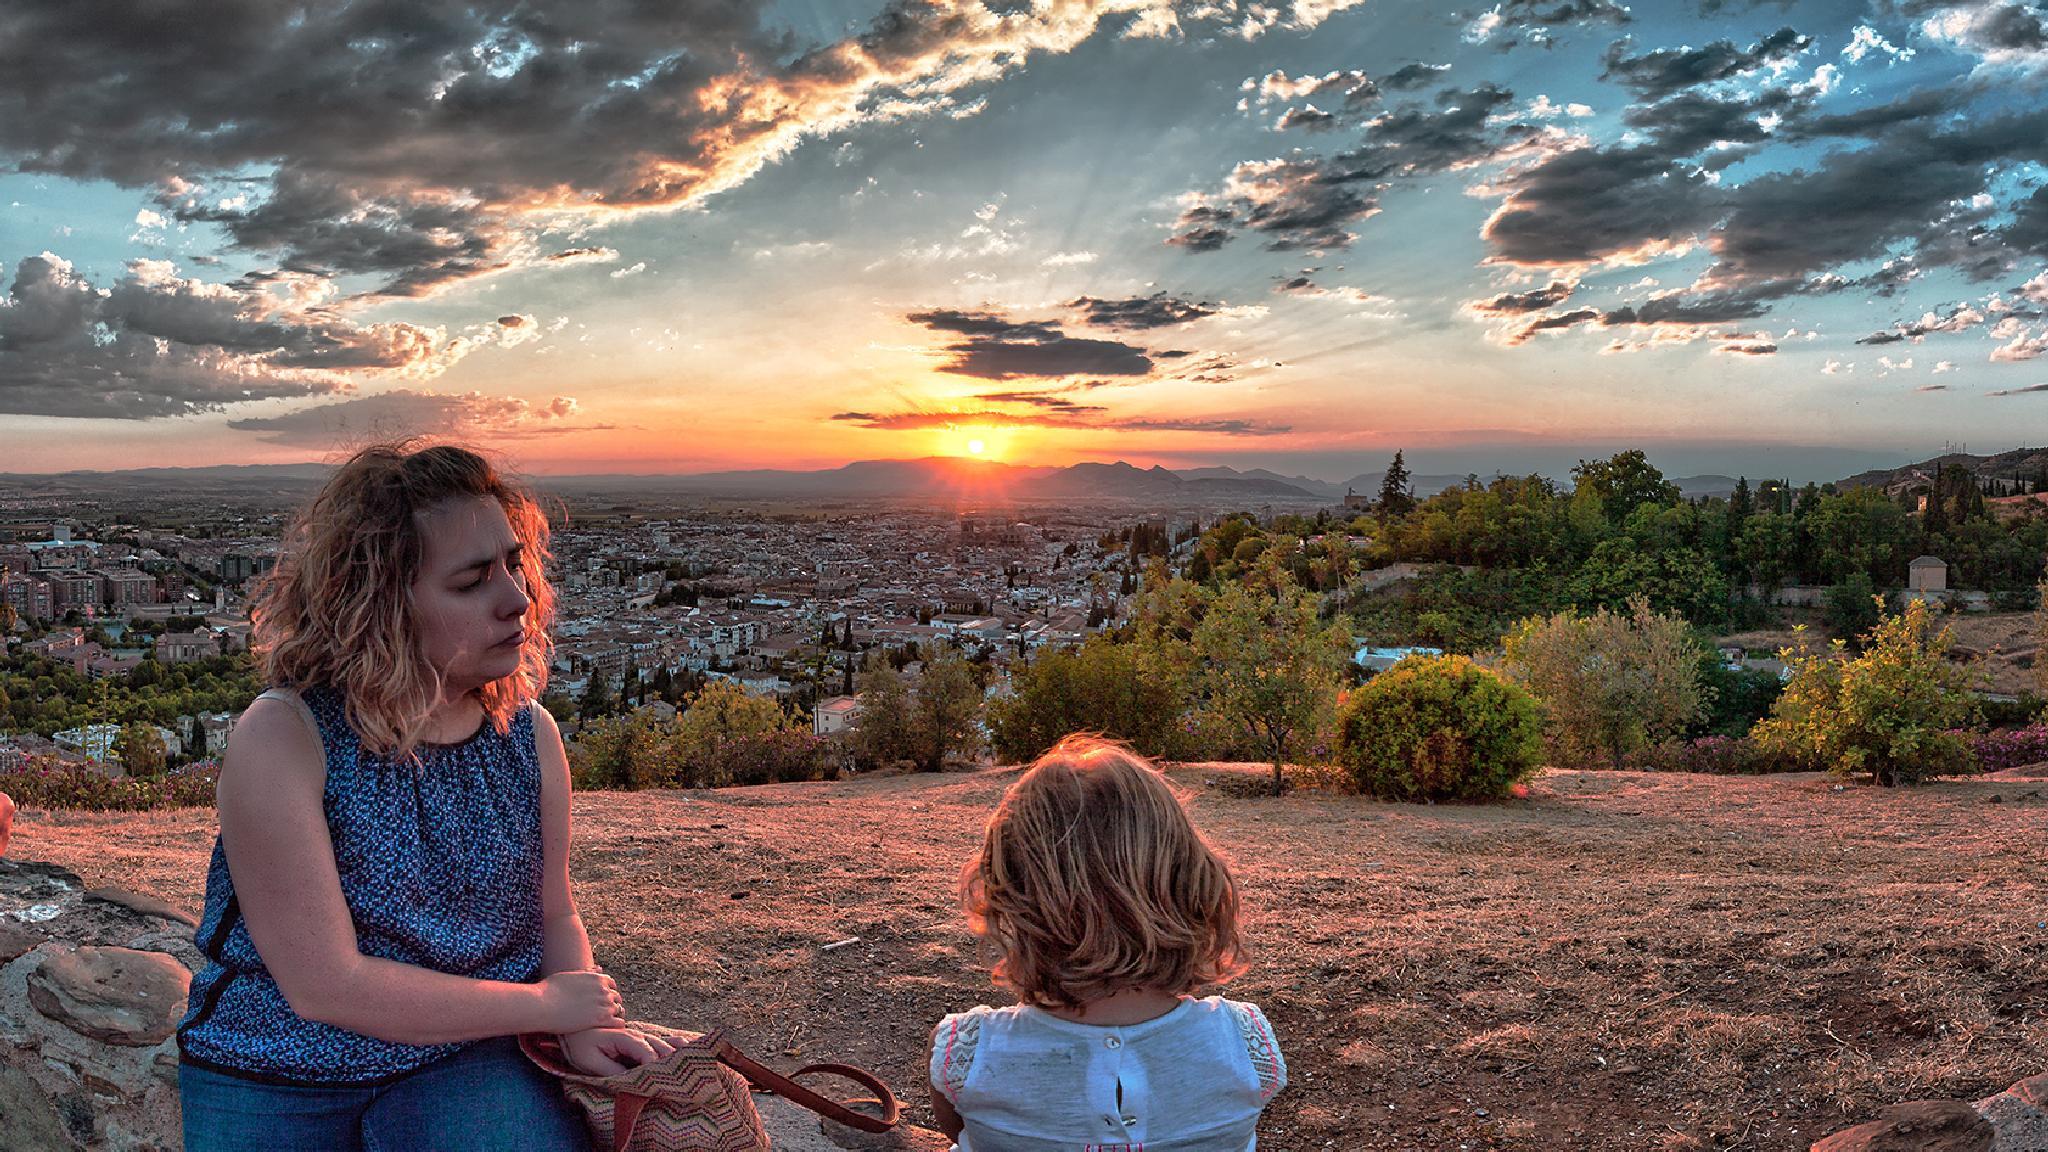 Watching th sunset in Granada, Spain by Francisco J Pérez Herrera